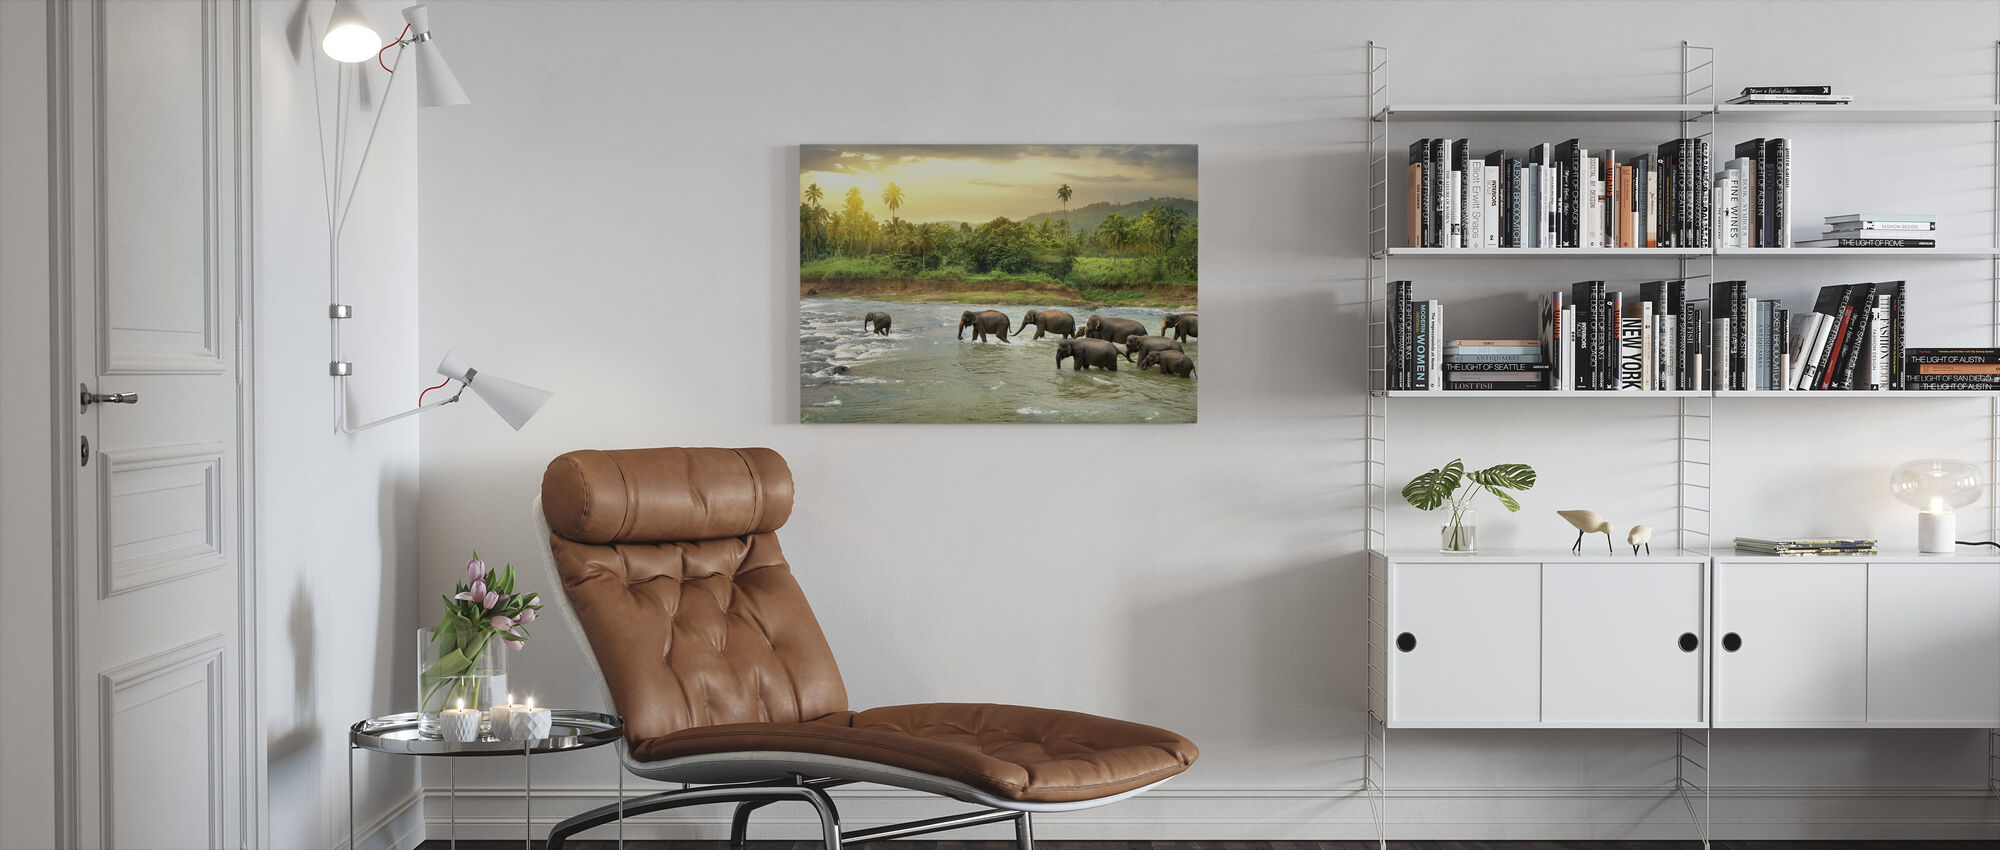 Wading Elephant Herd - Canvas print - Living Room